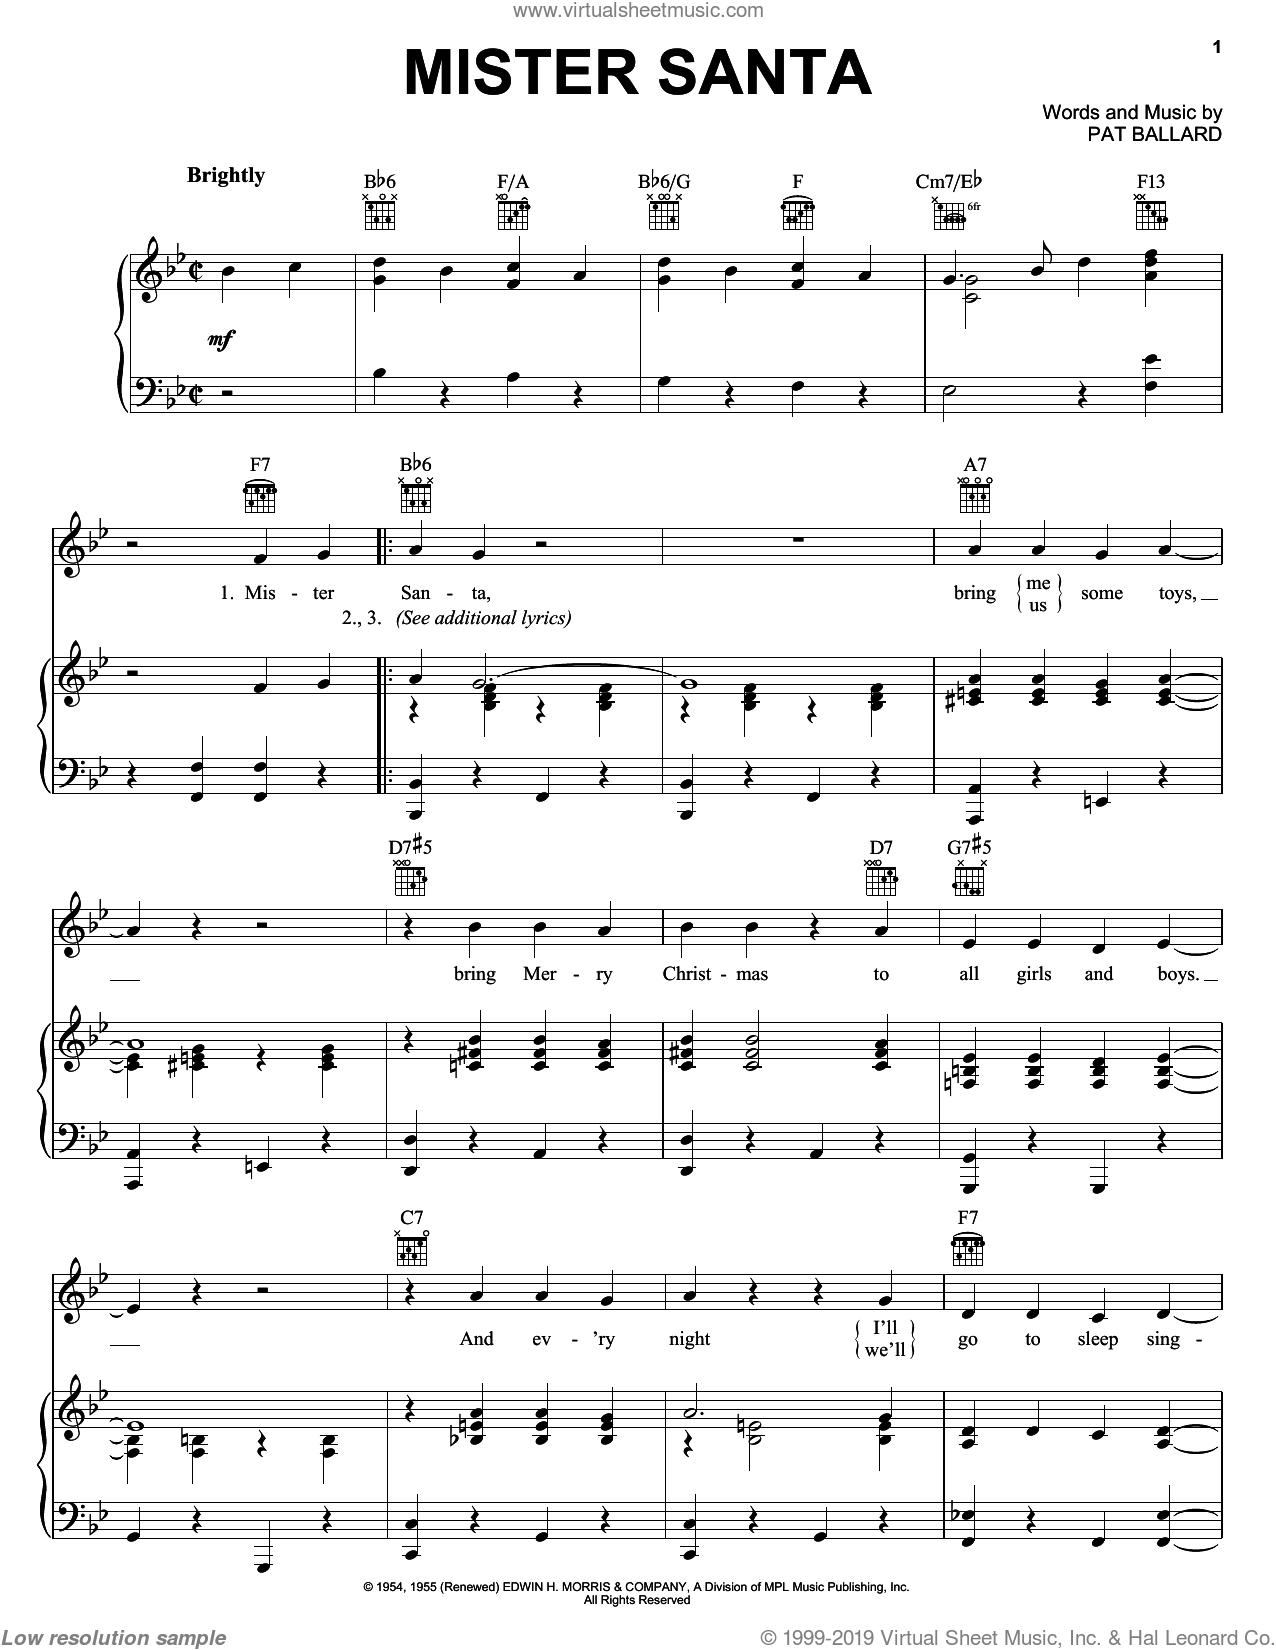 Mister Santa sheet music for voice, piano or guitar by Pat Ballard, intermediate skill level